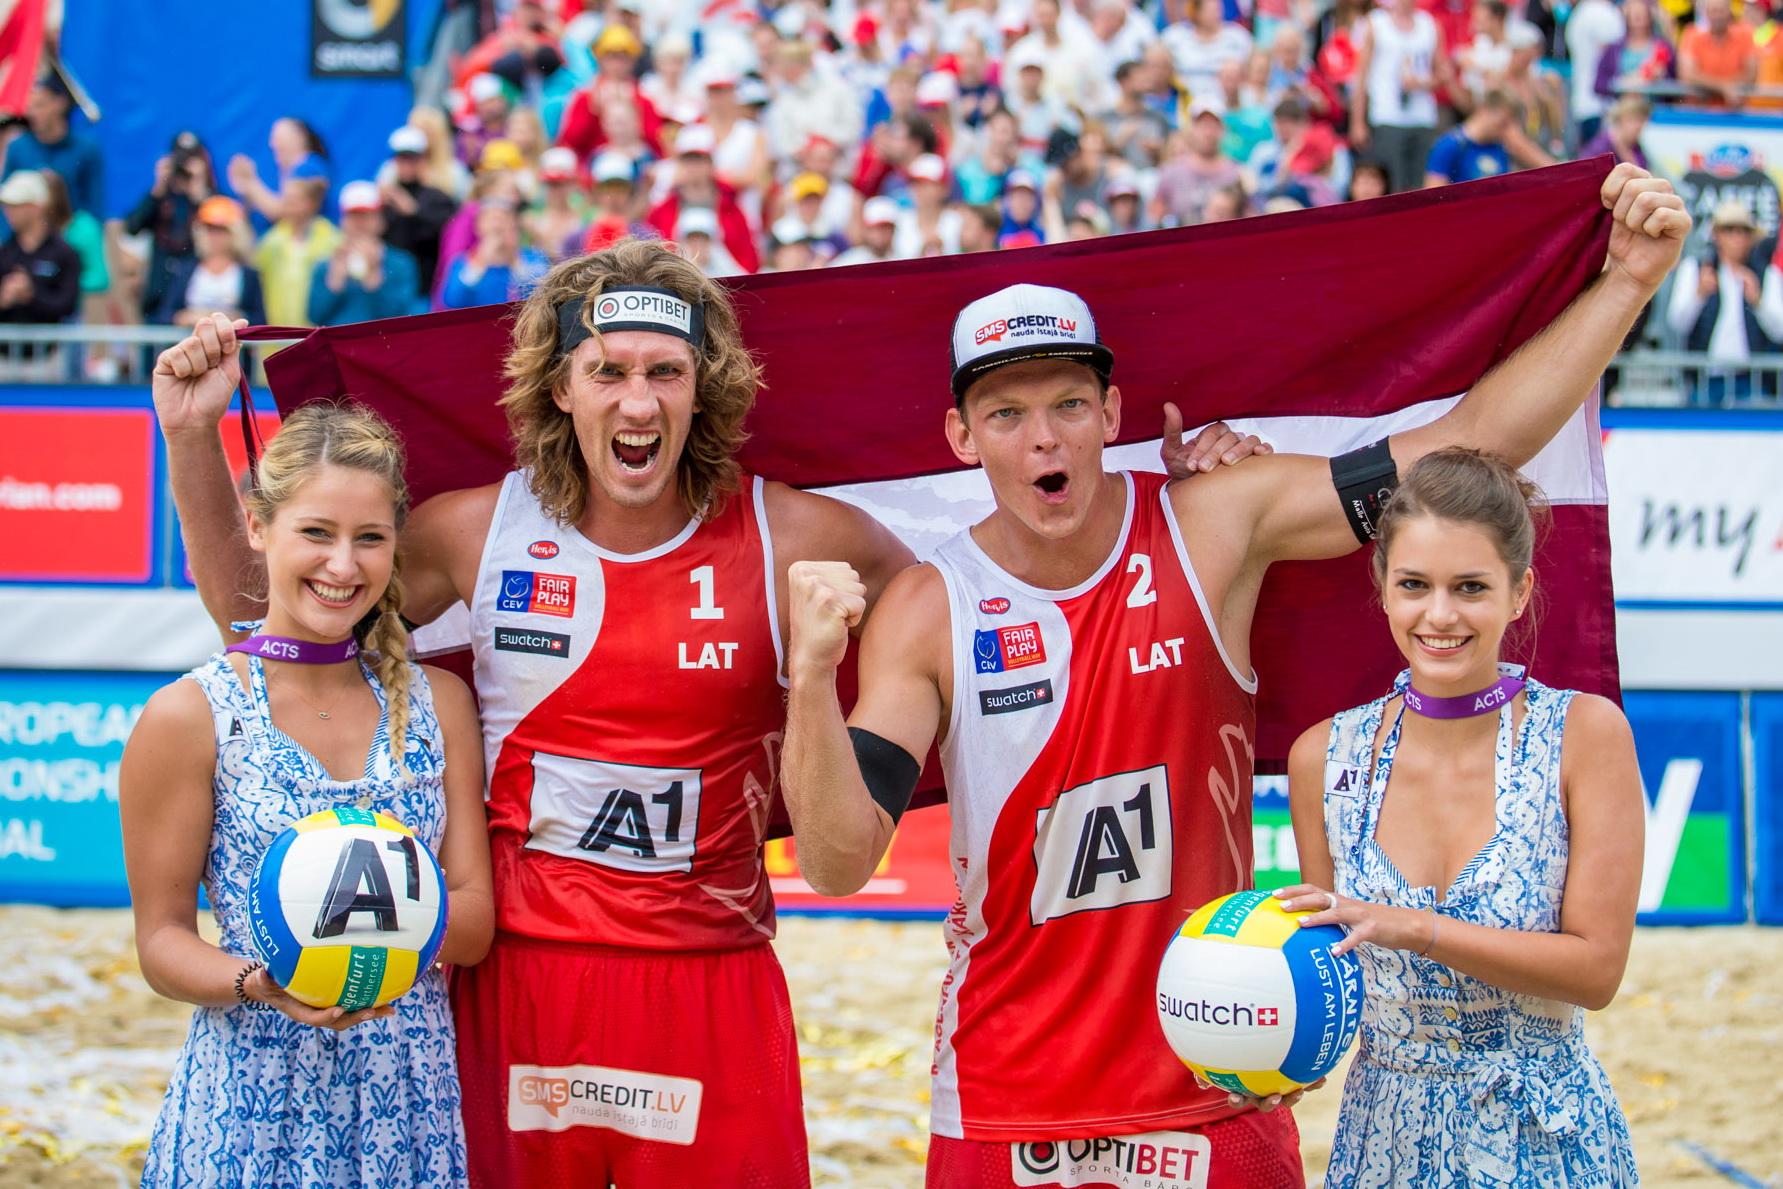 Janis Smedins und sein Partner Aleksandrs Samoilovs (Martin Steinthaler / tinefoto.com)